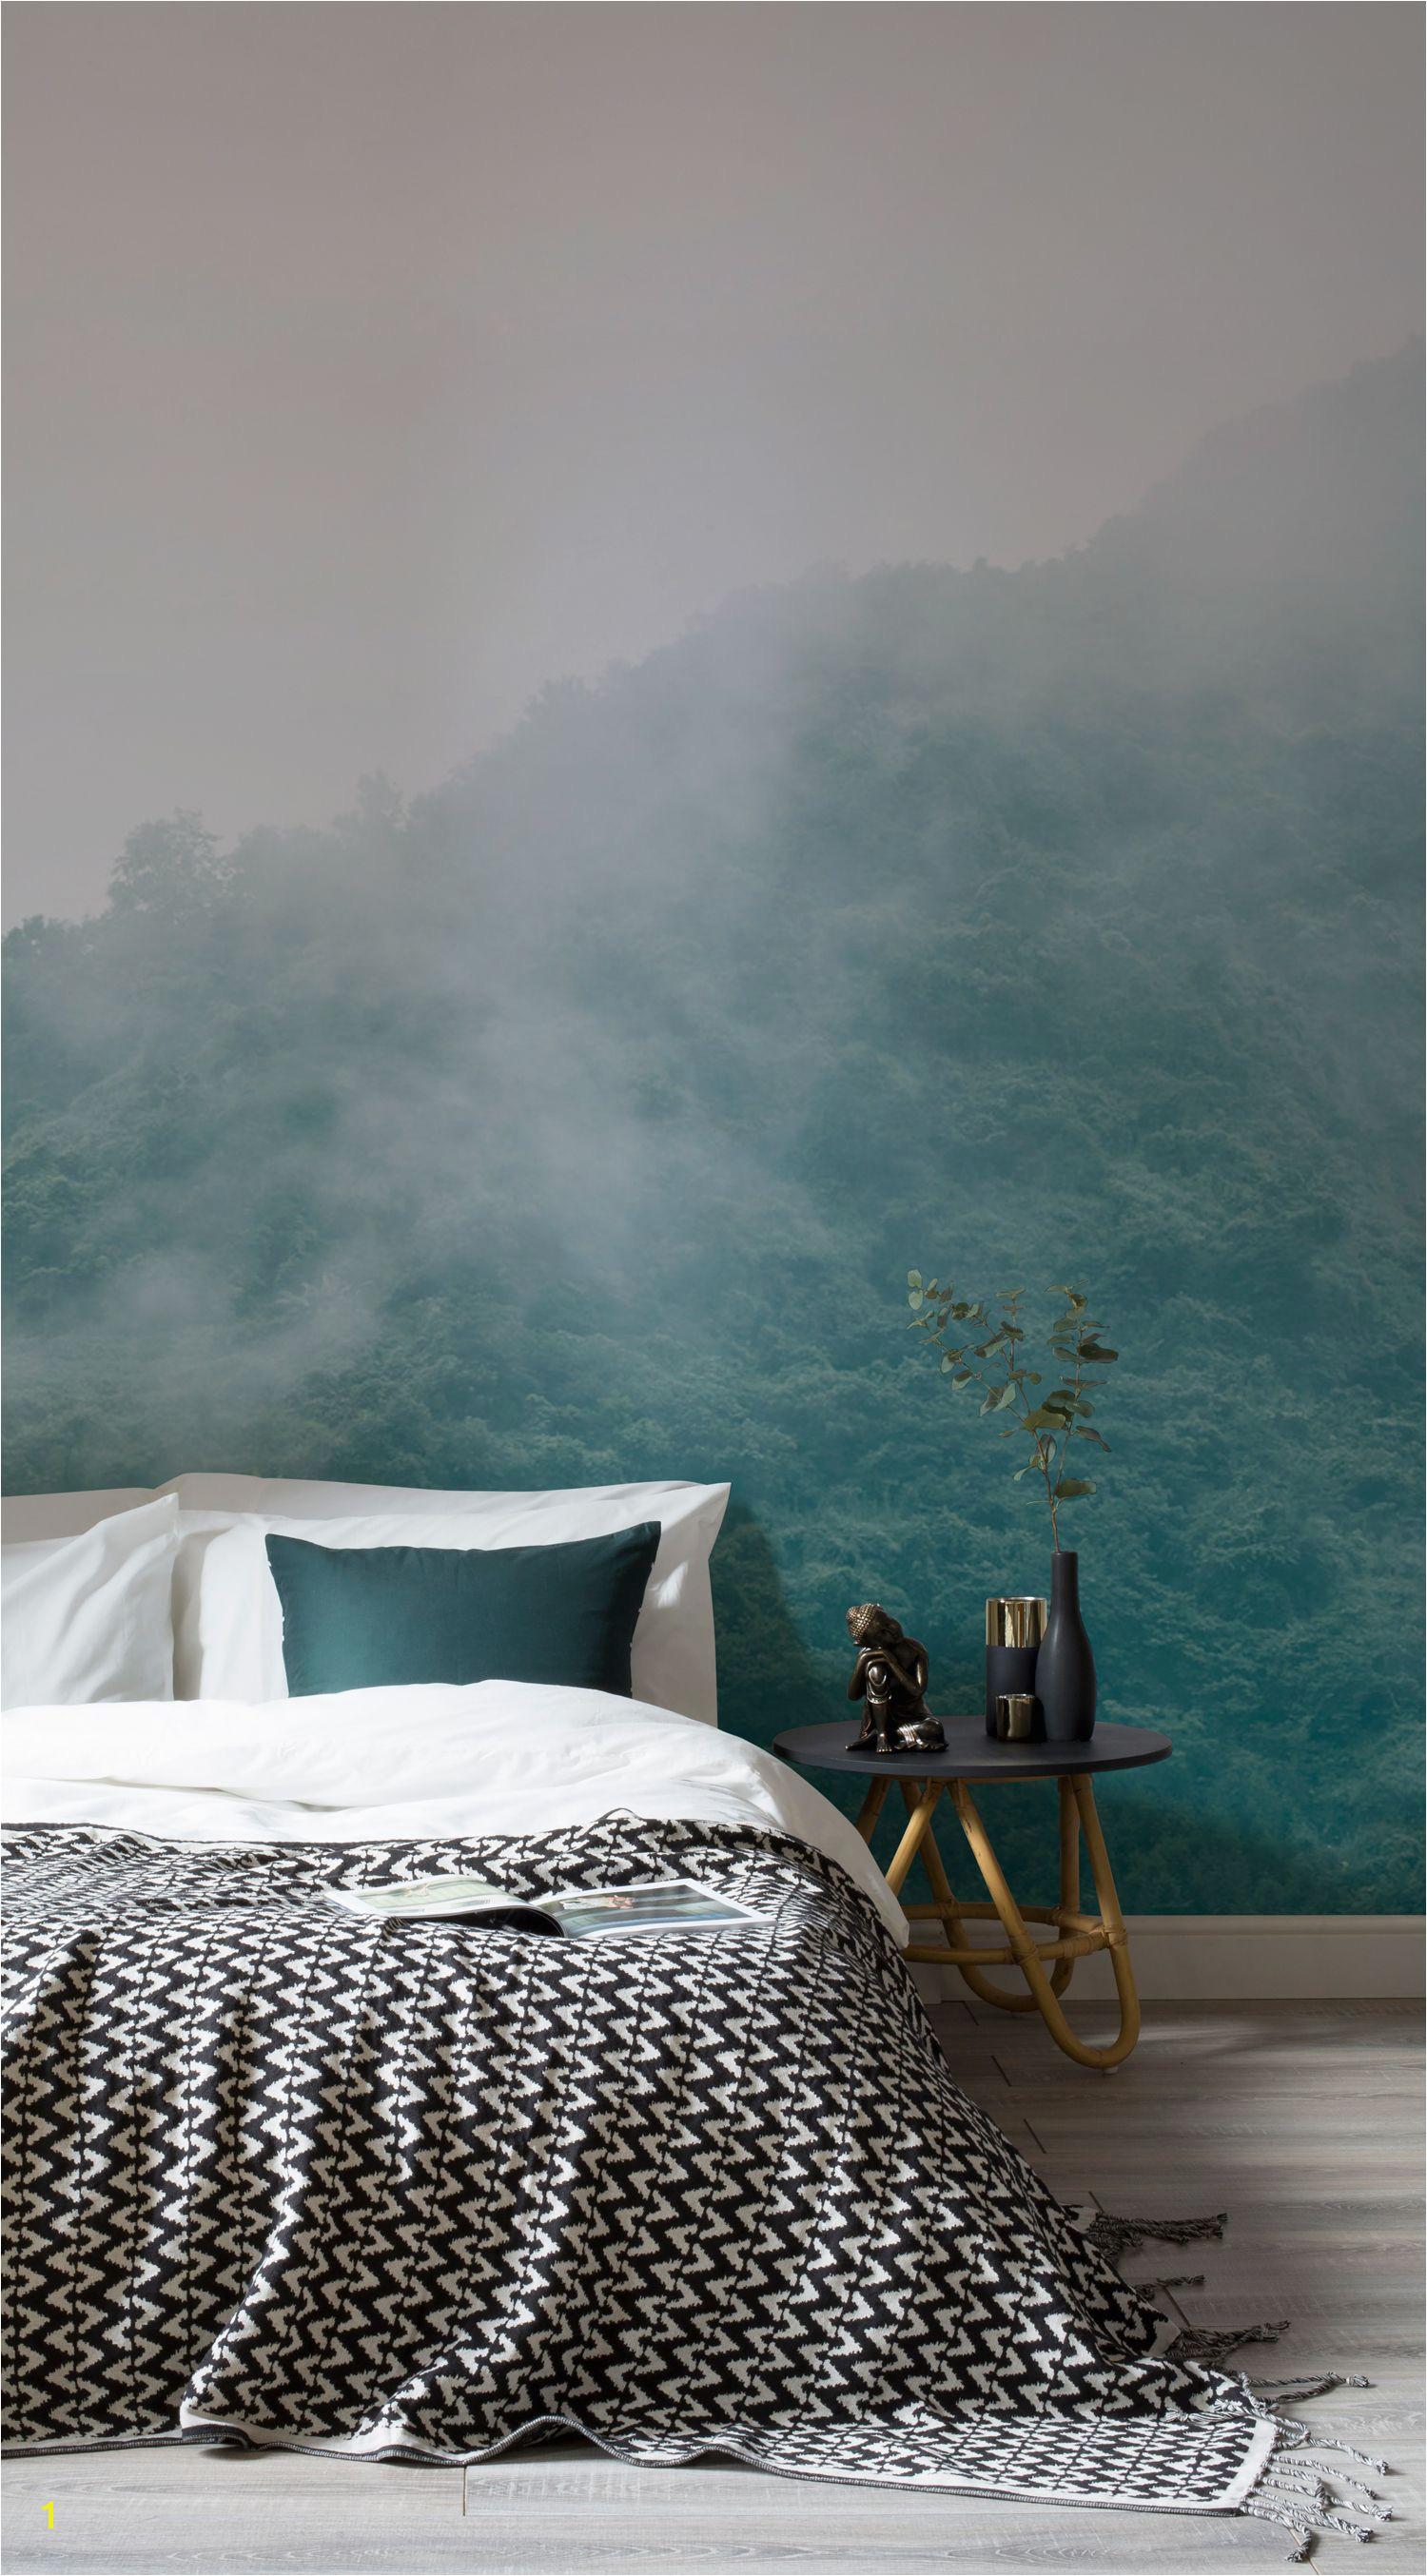 Contemporary Wall Murals Interior 6 Wallpapers that Banish Stress Wallpaper Pinterest